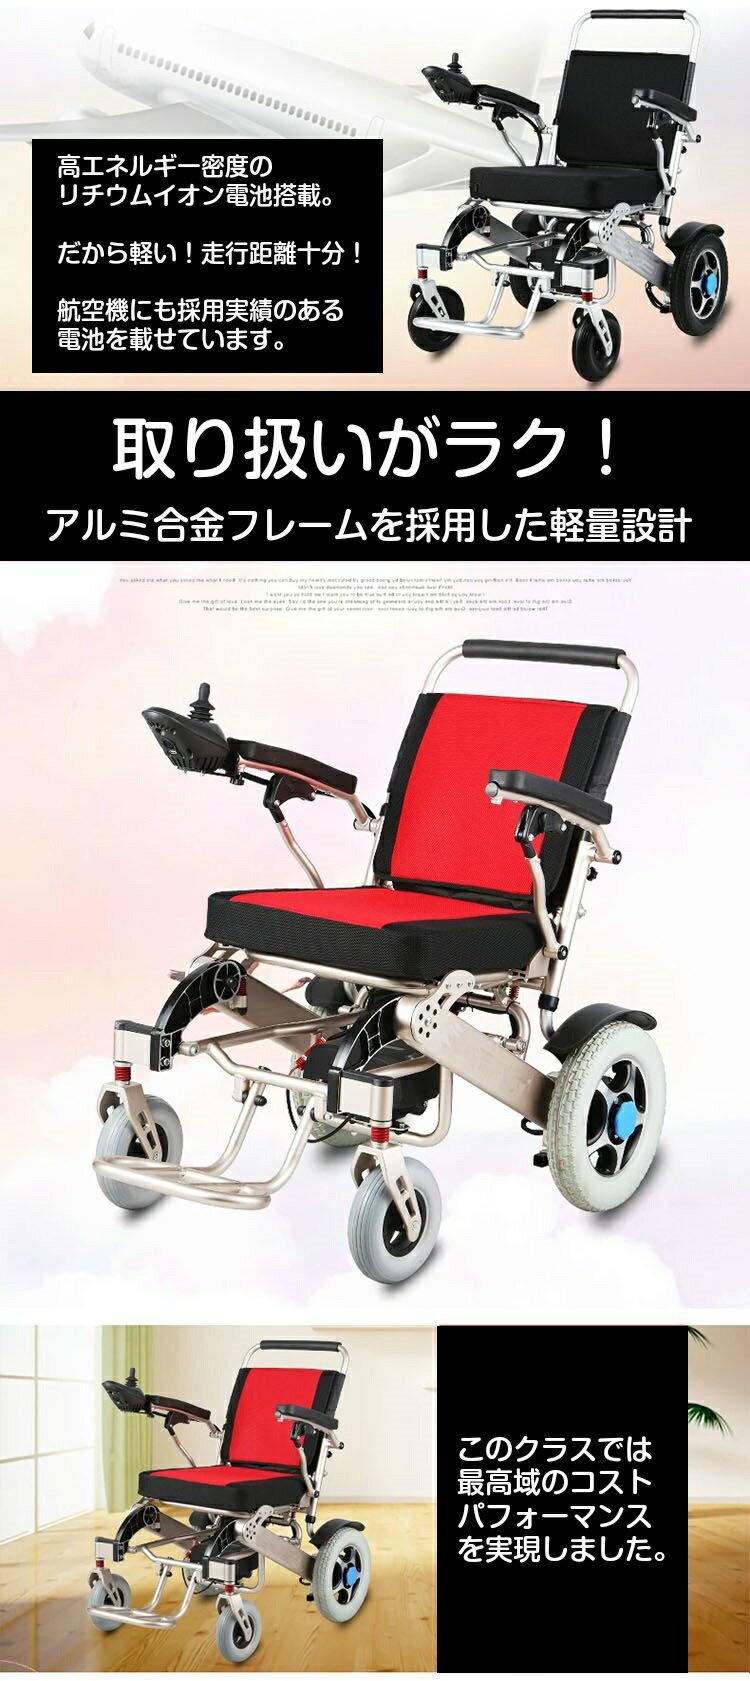 PORTUS(ポルタス)『電動車椅子フリーダム』